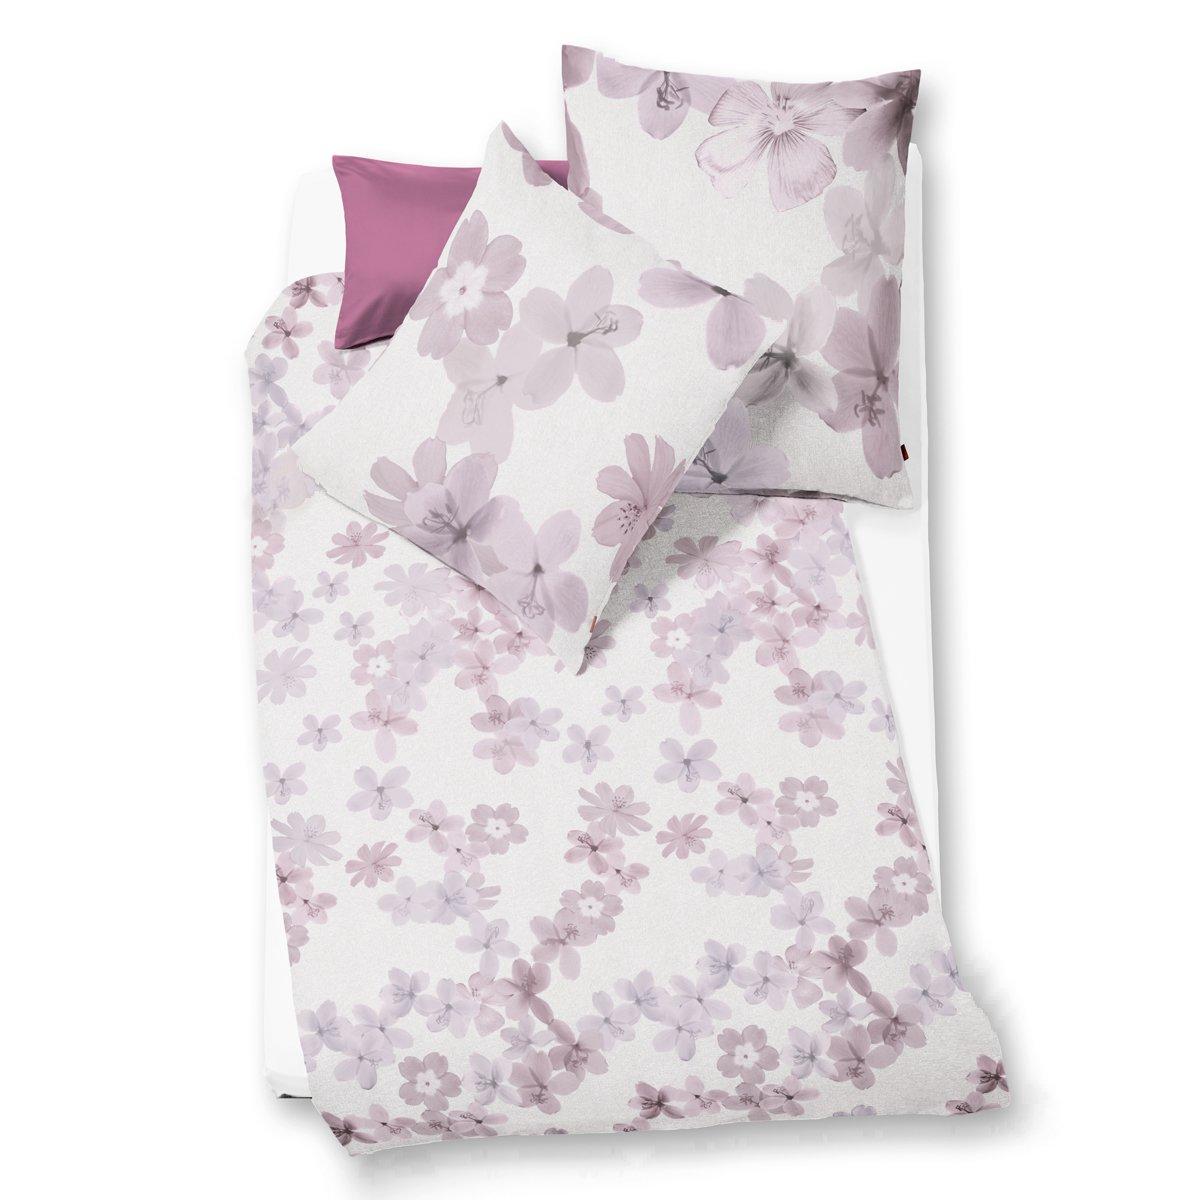 Fleuresse Mako Satin Bettwäsche Modern Garden Blütenpracht Berry Rosé Silber, Größe 135x200cm Bettwäsche